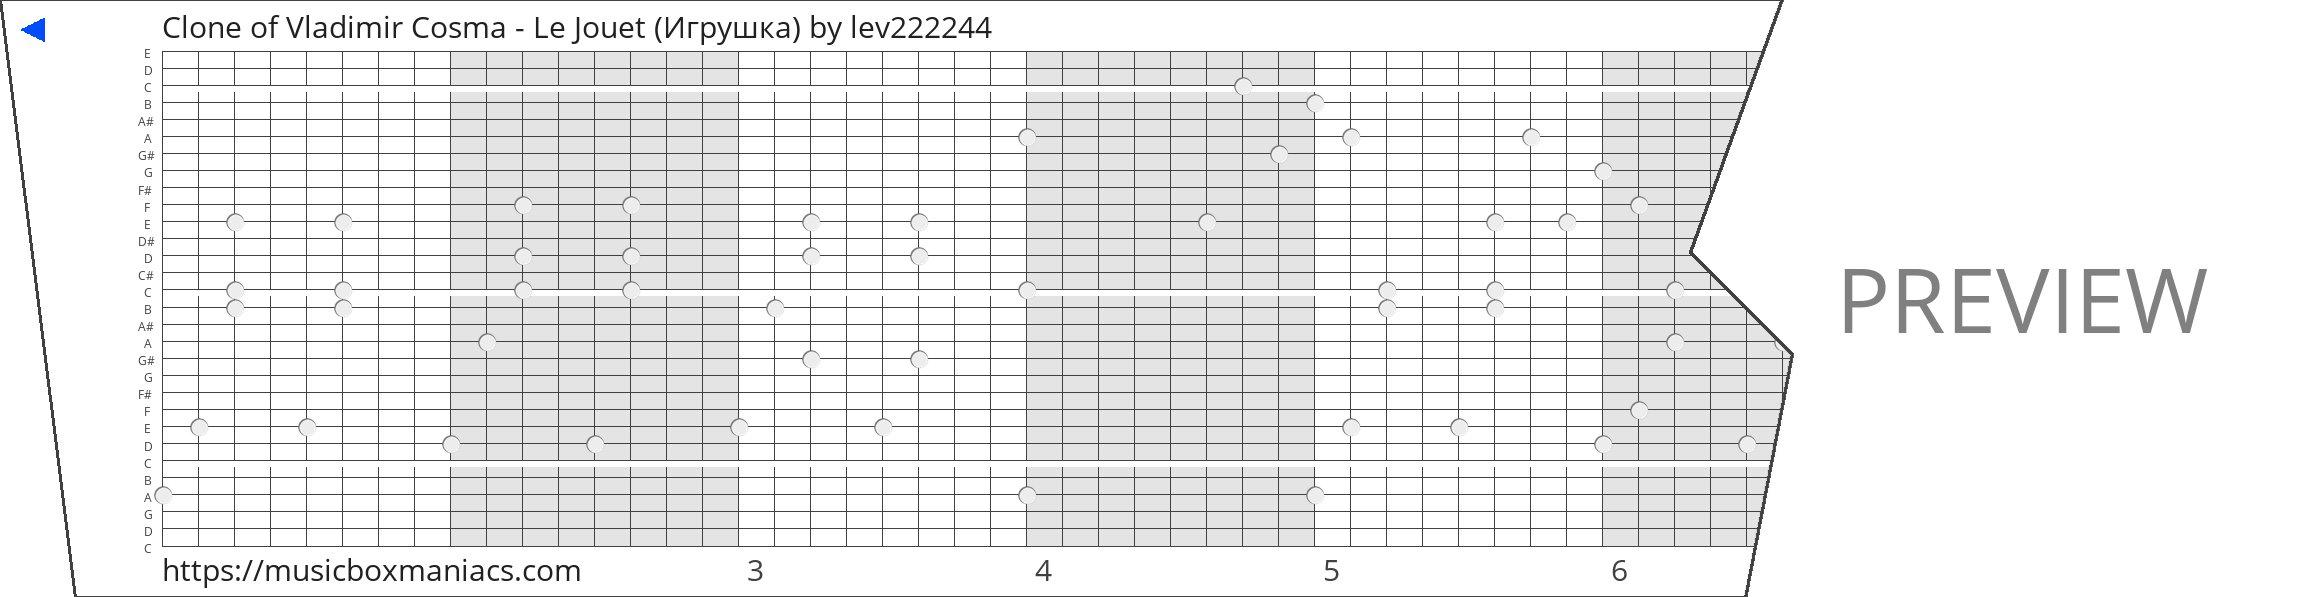 Clone of Vladimir Cosma - Le Jouet (Игрушка) 30 note music box paper strip